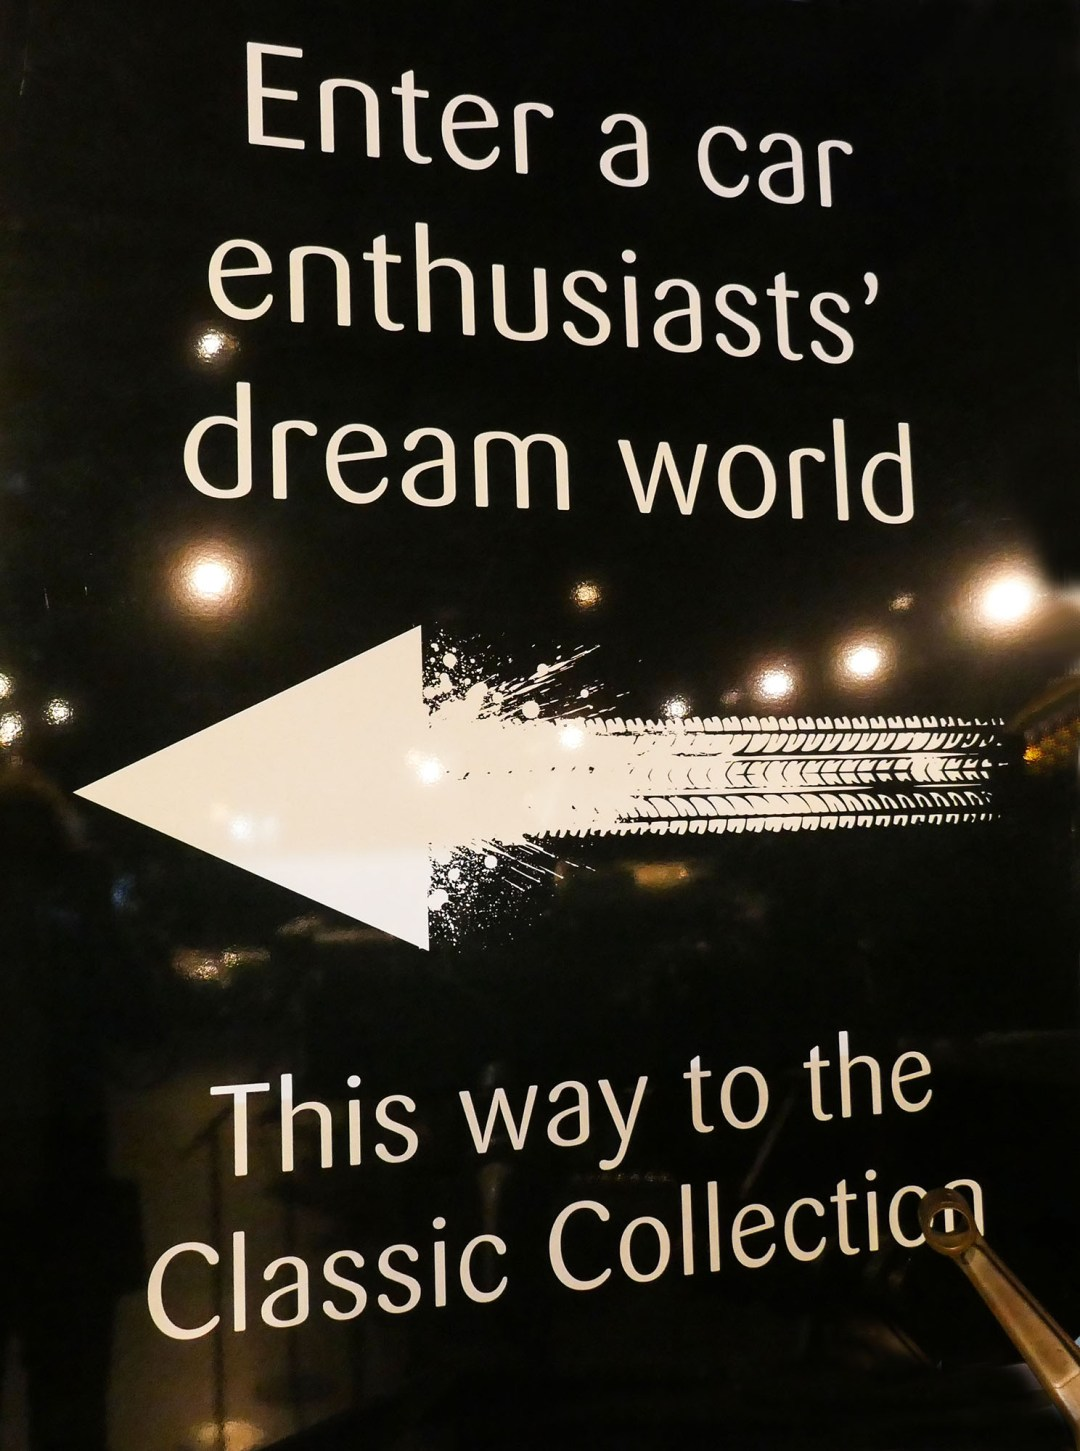 WOW dream world for boomervoice